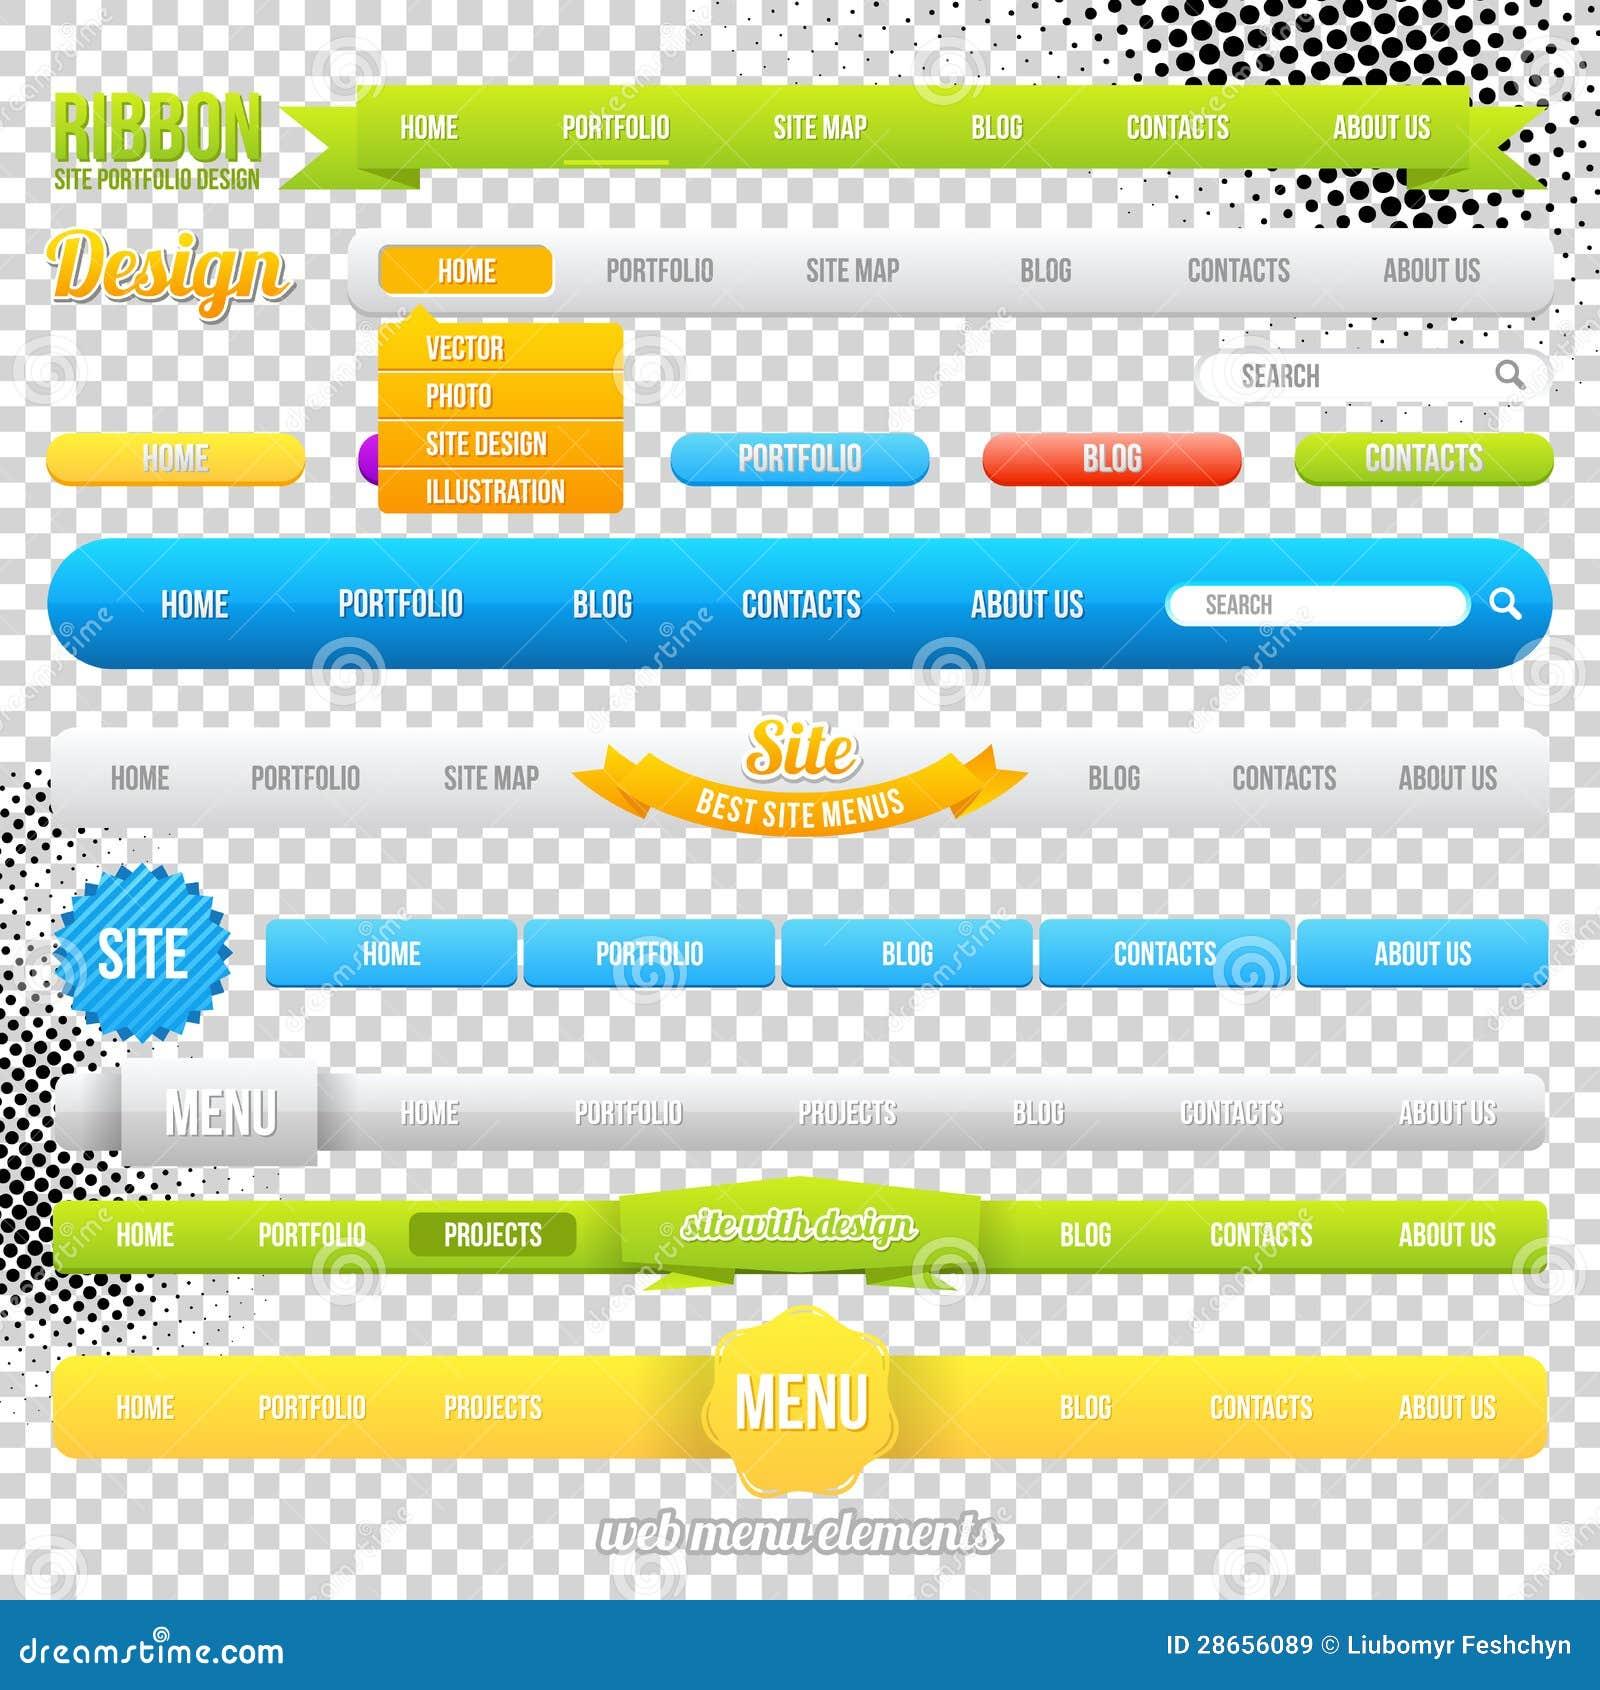 web menu element templates stock vector illustration of modern